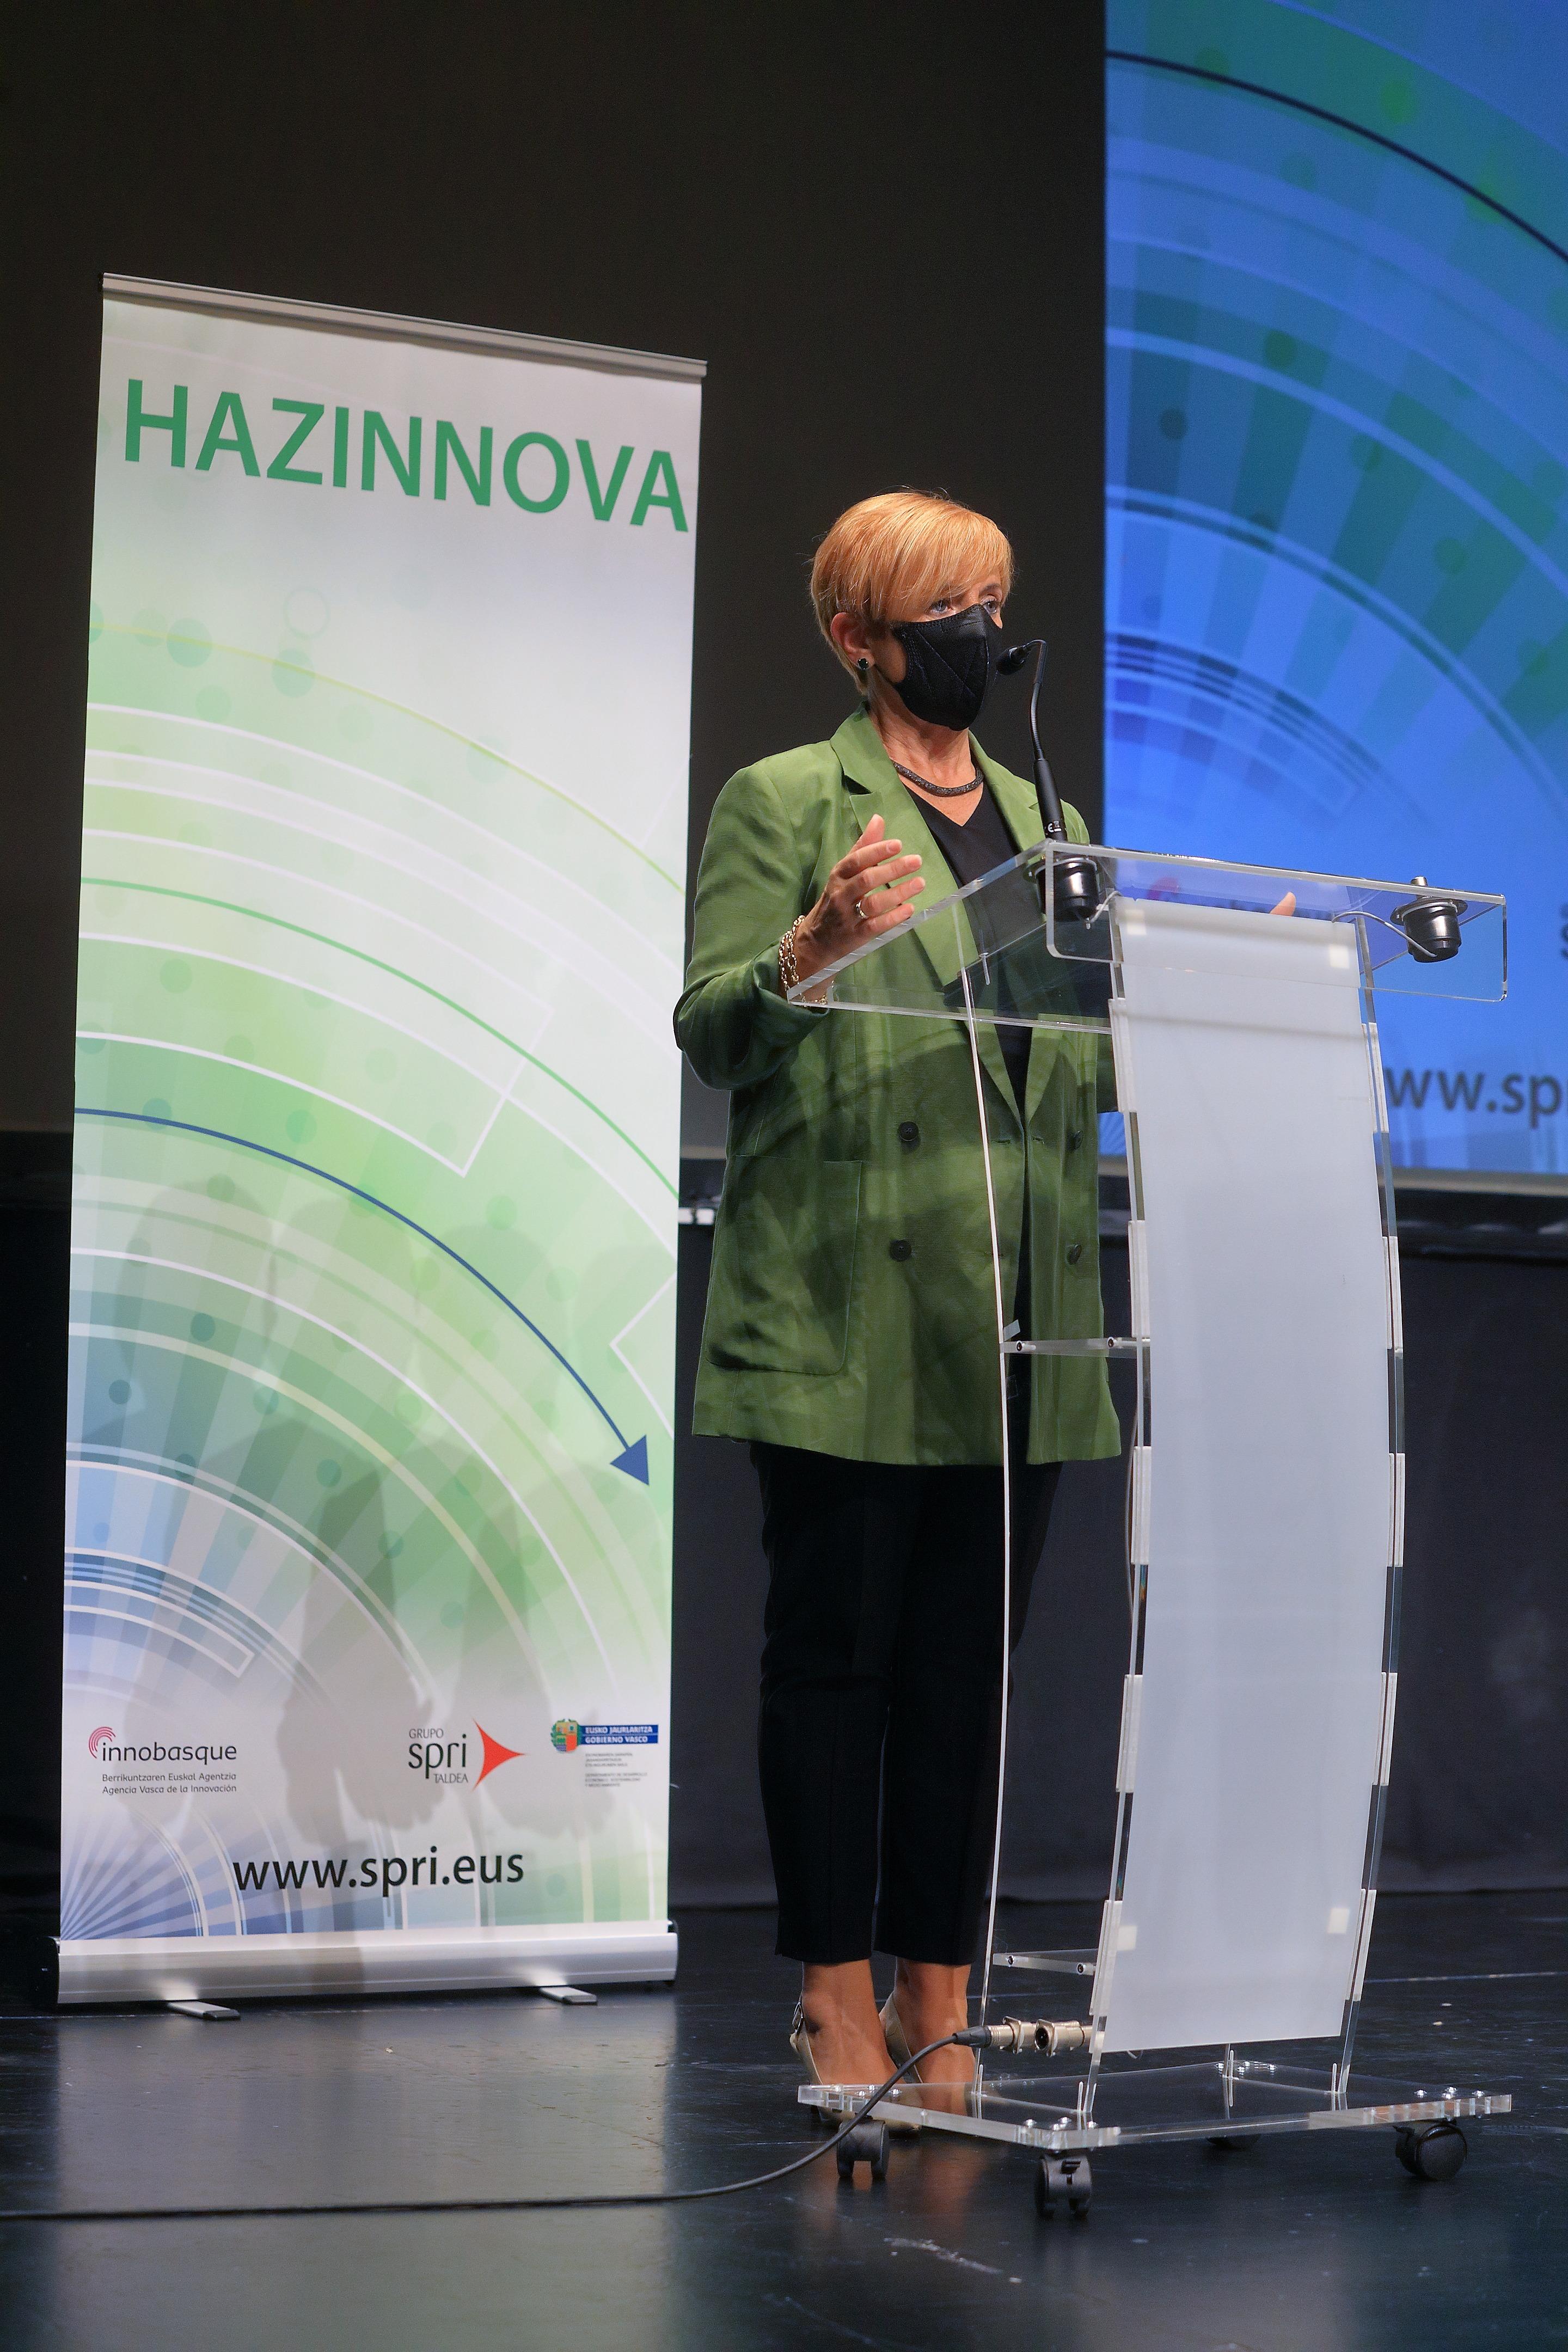 Hazinnova03.JPG